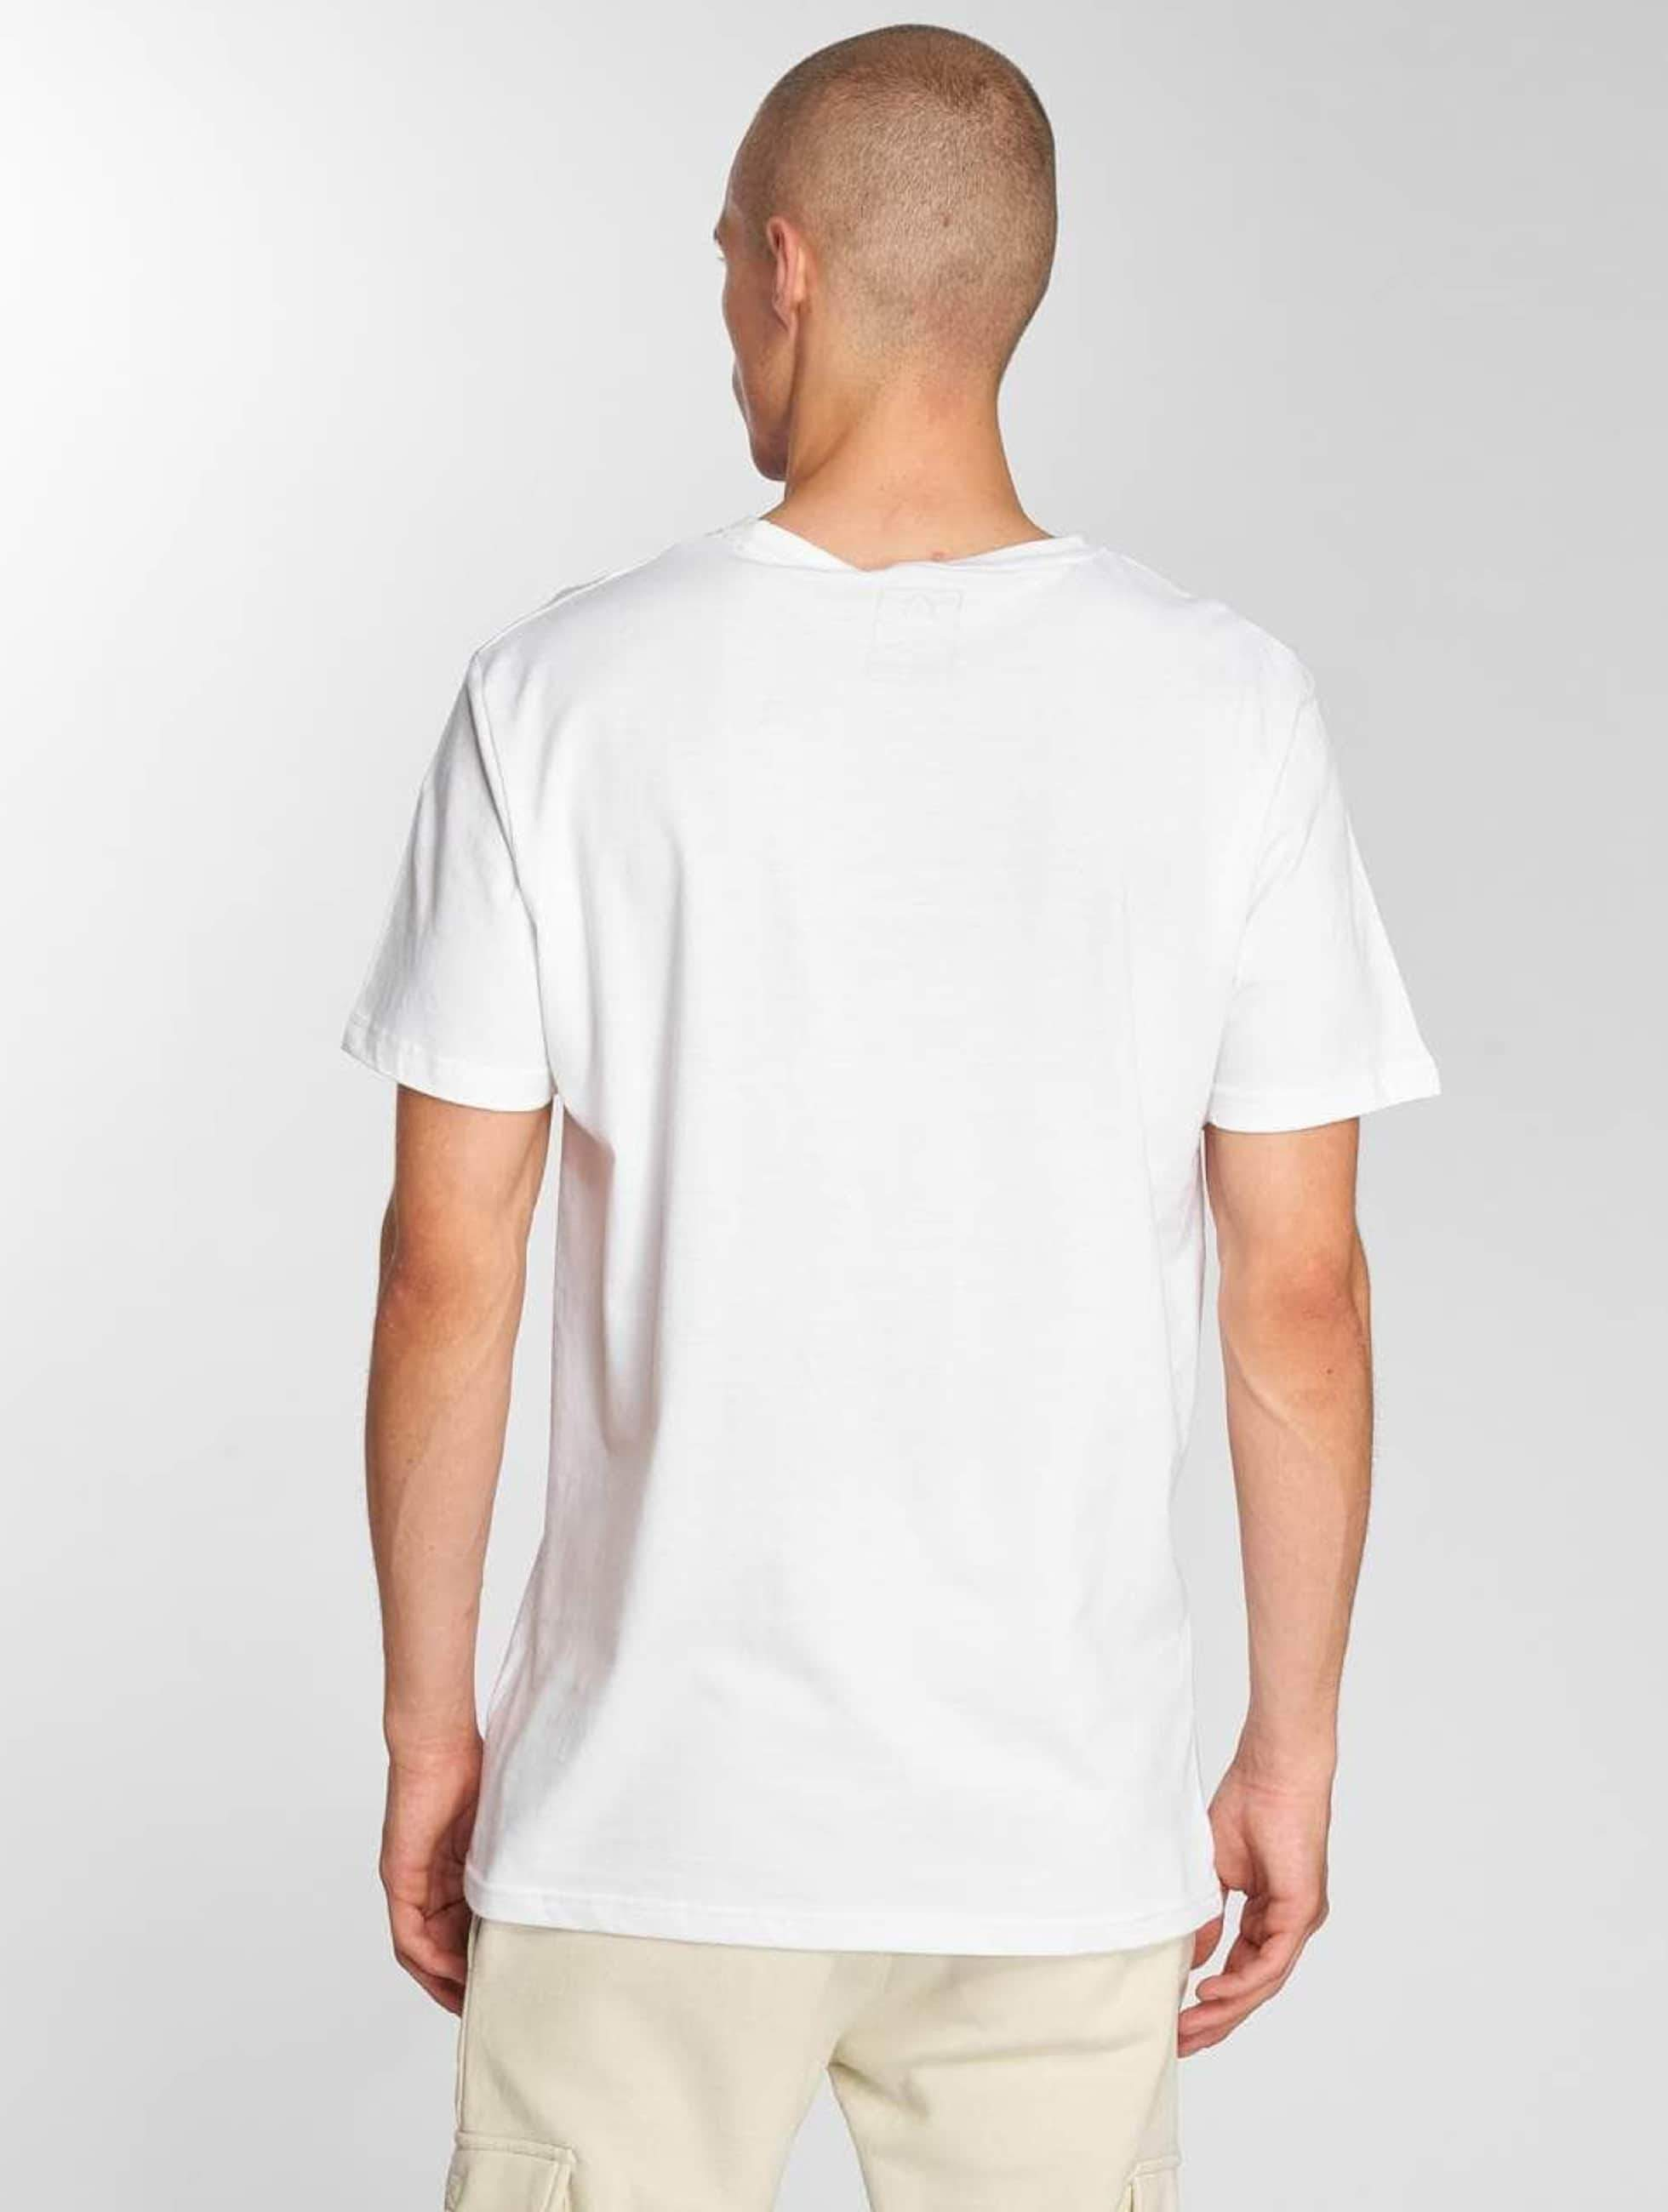 Just Rhyse / T-Shirt Paita in white XL